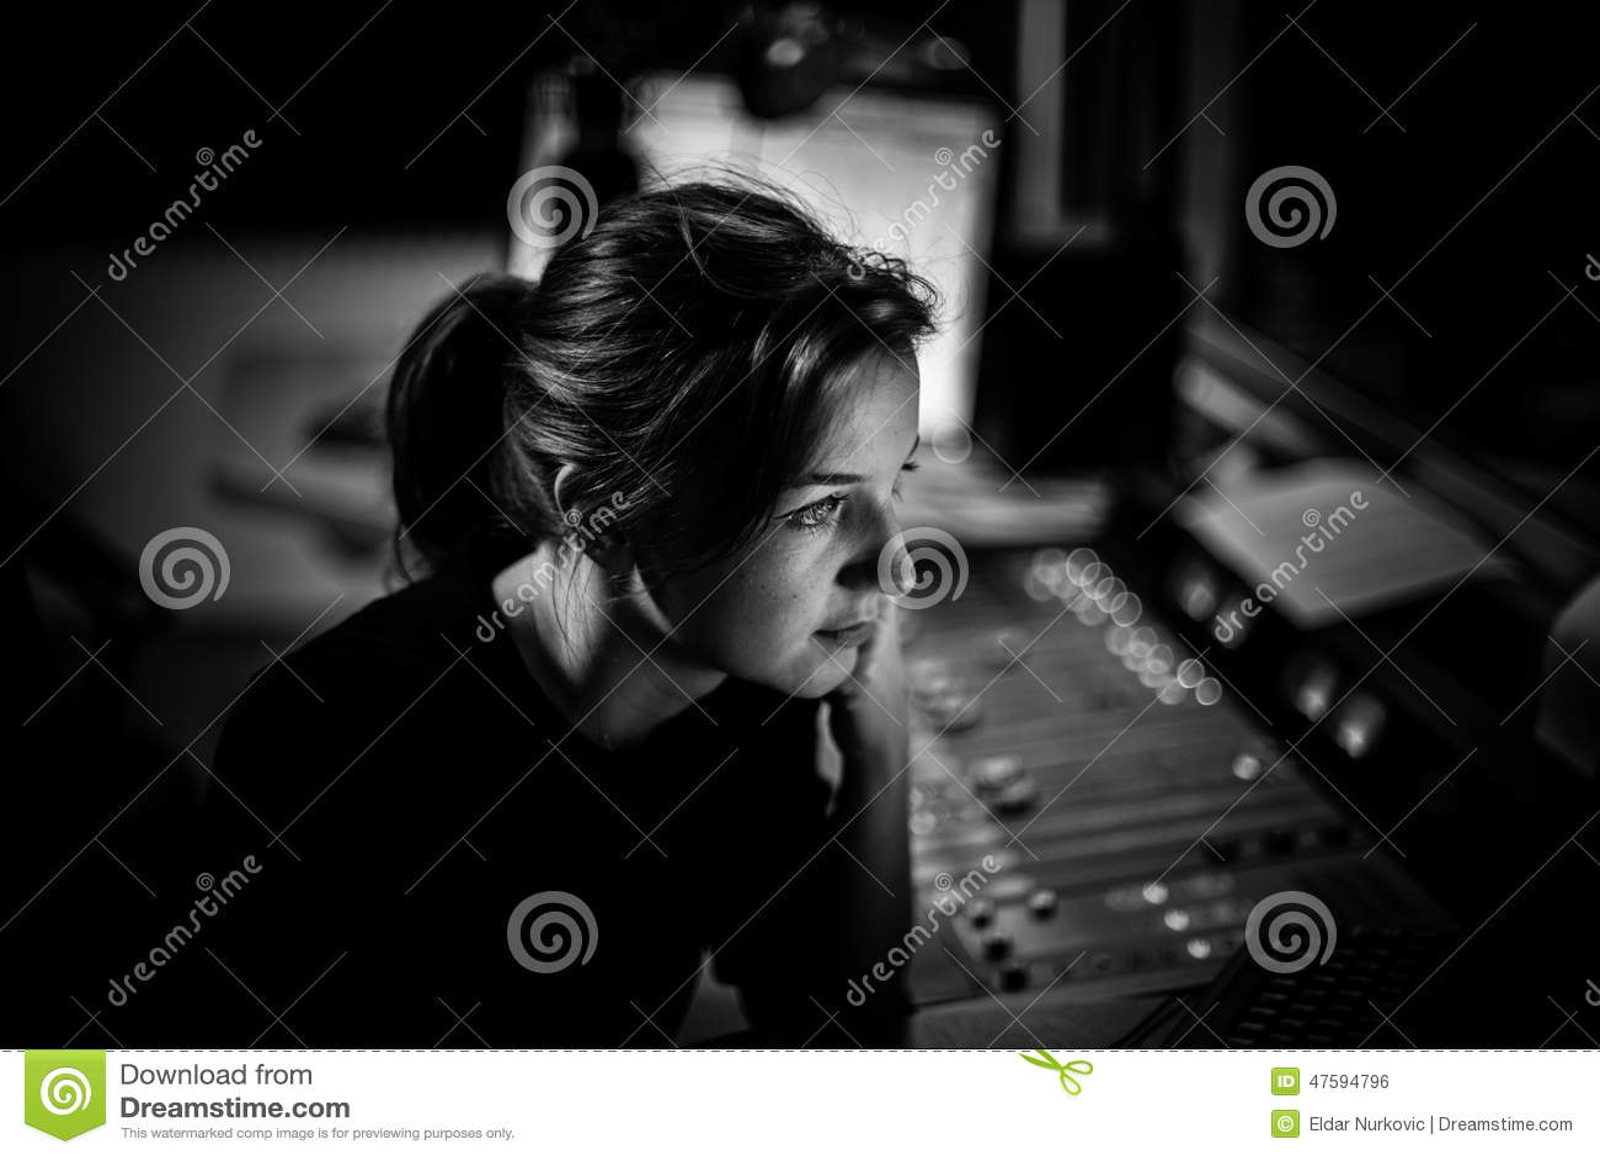 Presenter or host in radio station hosting show for radio live in Studio. Female radio director in studio. Radio producer woman